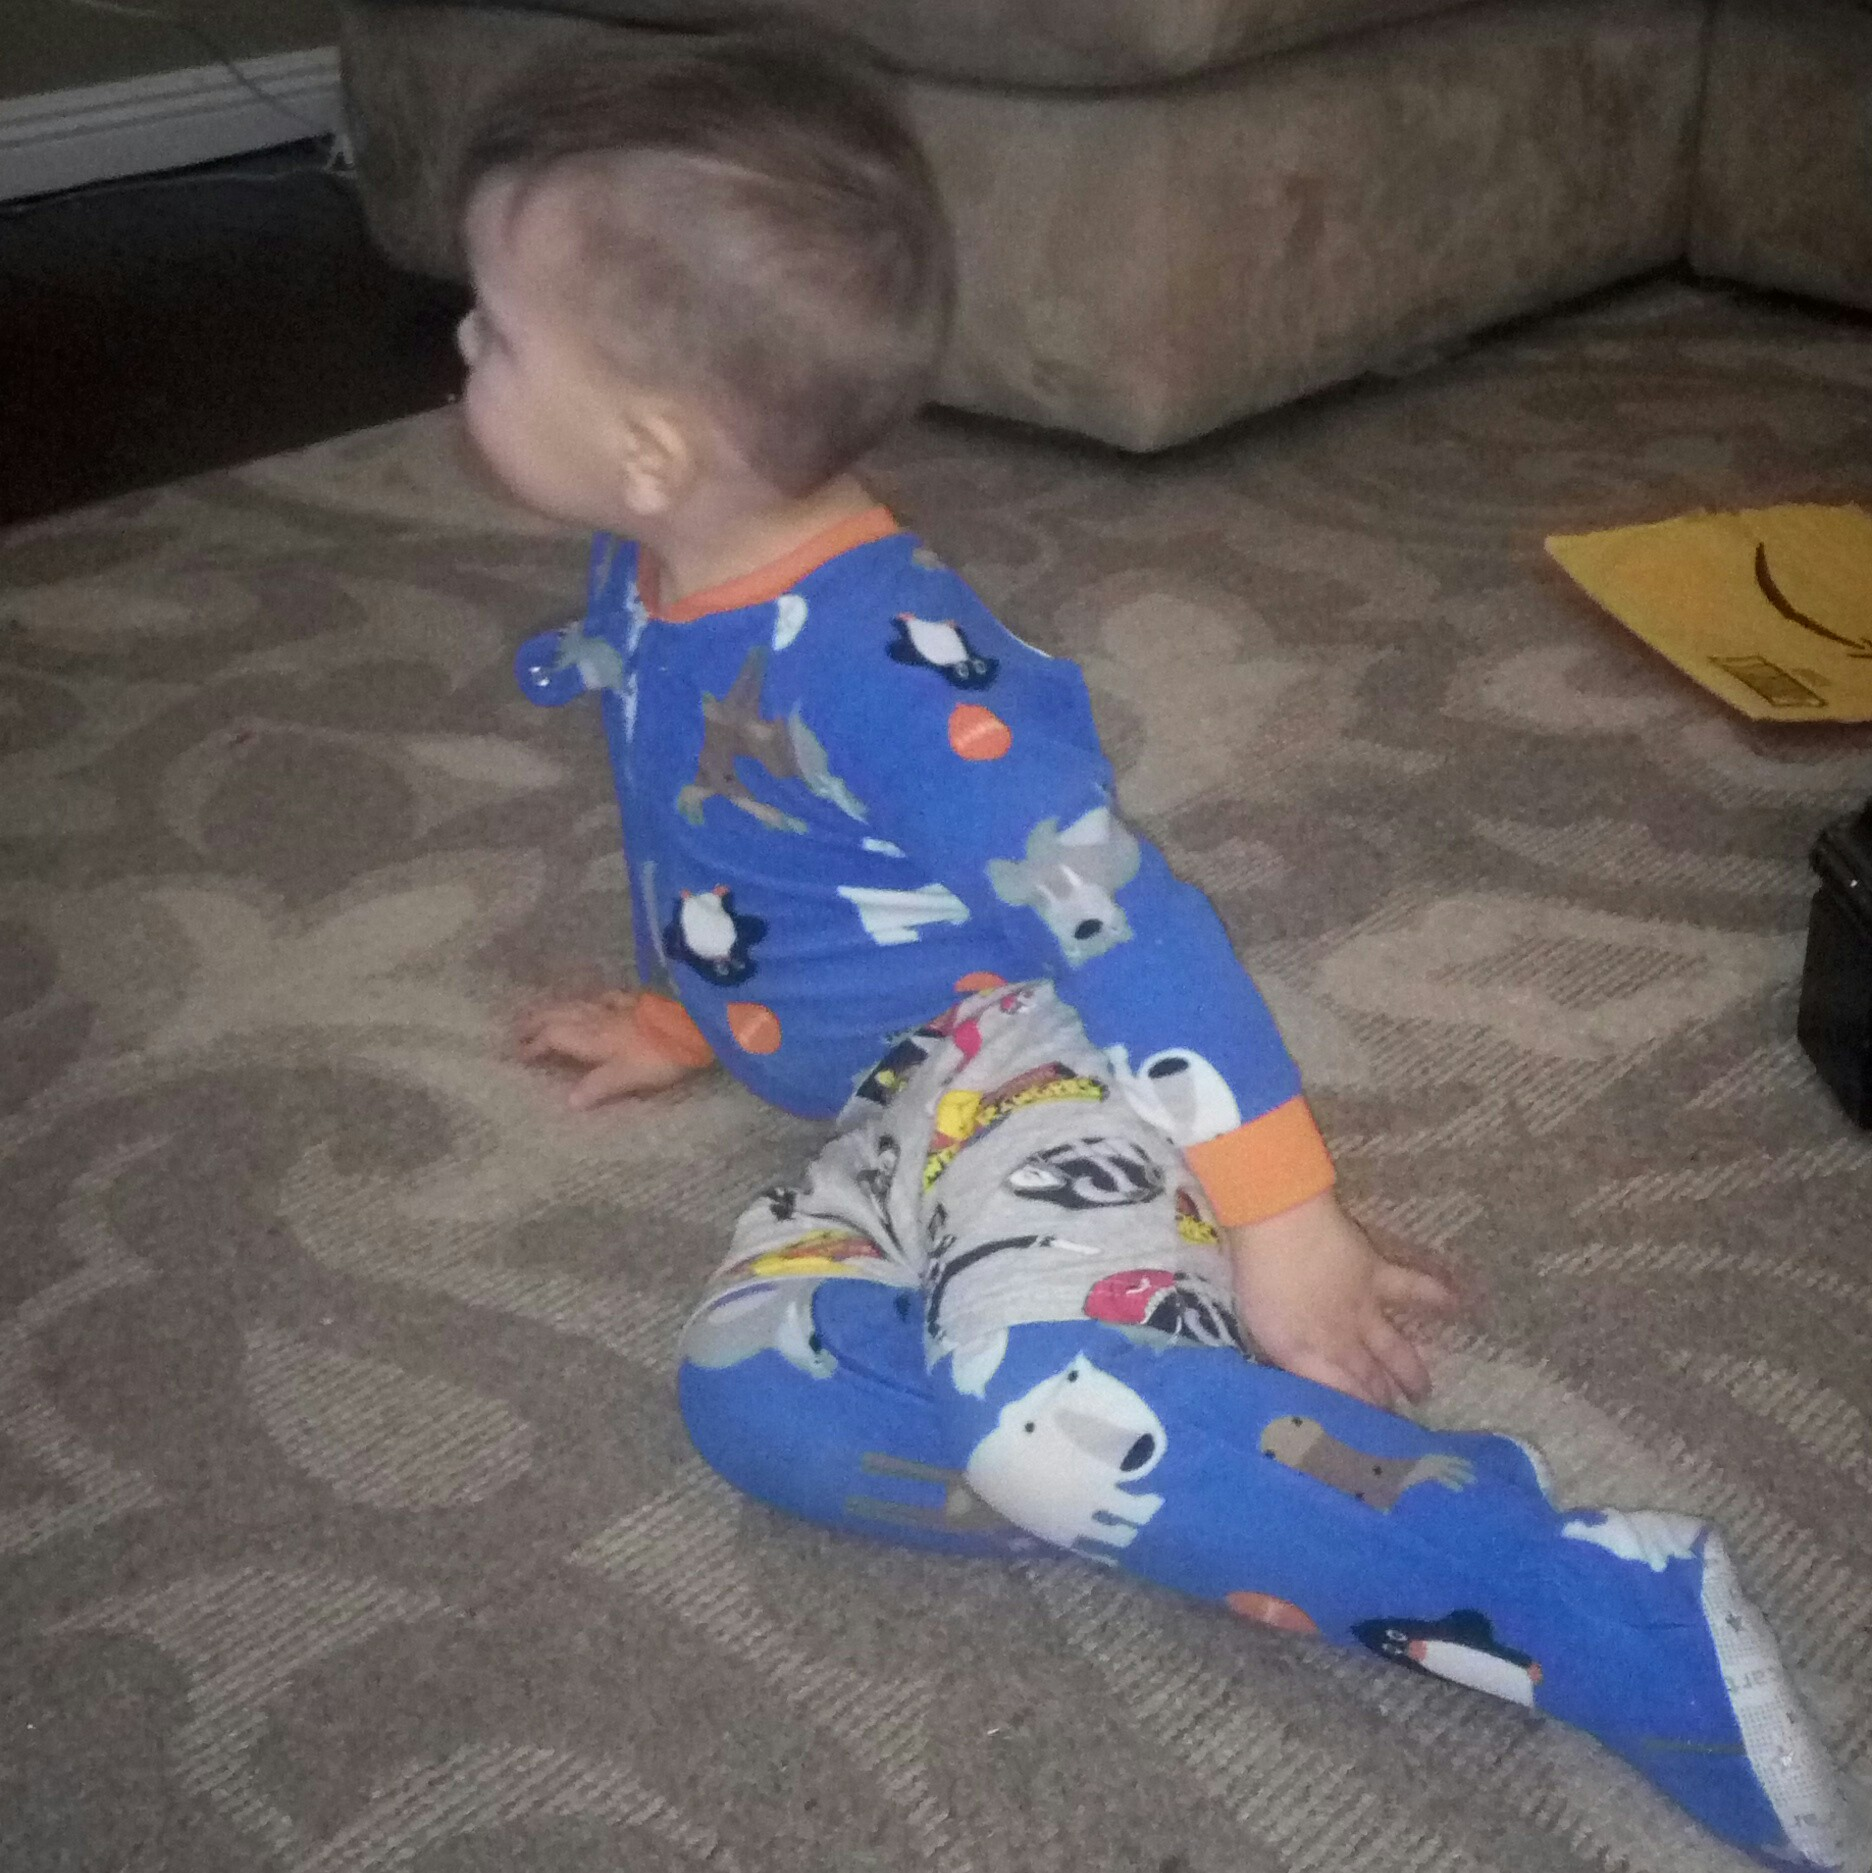 toddle fashion sense shorts over footsie pajamas freedom